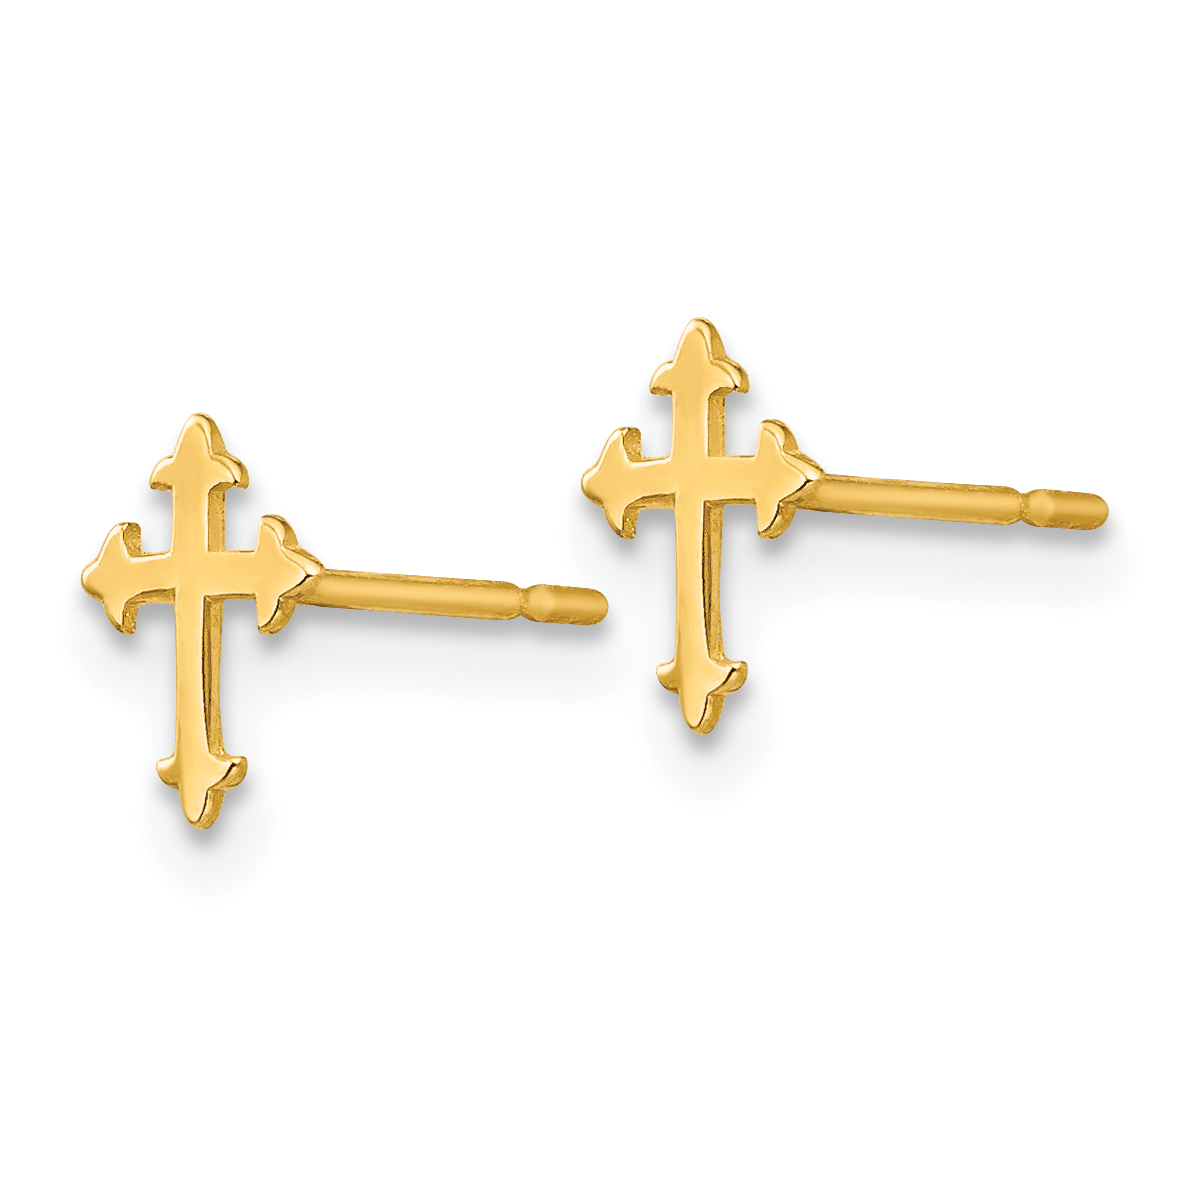 14K Yellow Gold Madi K Children's Cross Post Earrings - image 1 de 2